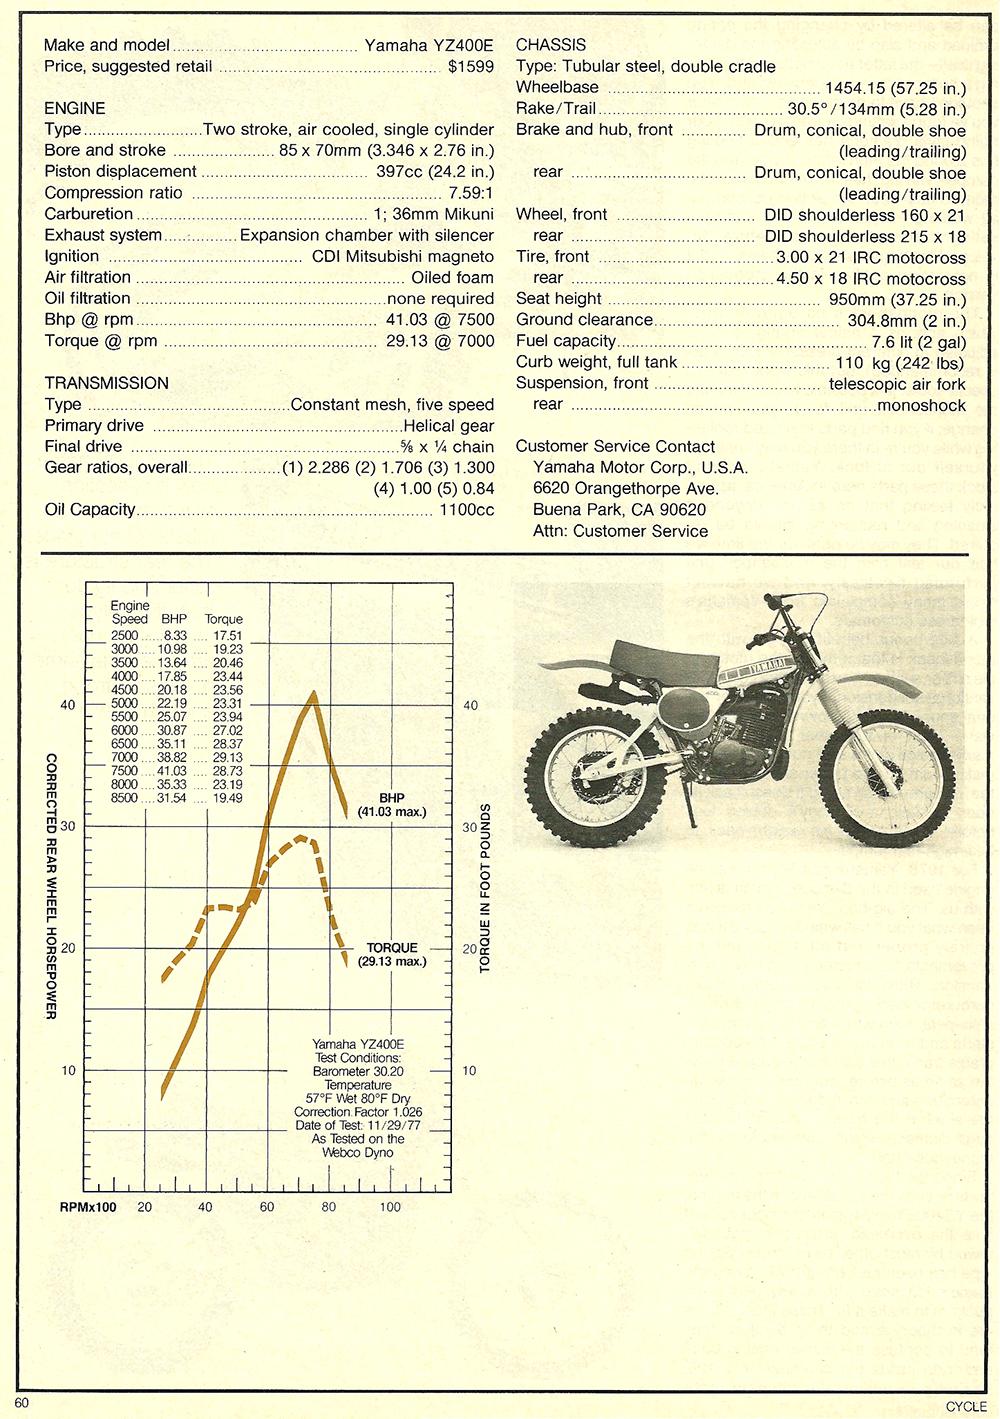 1978 Yamaha YZ400E road test 5.jpg